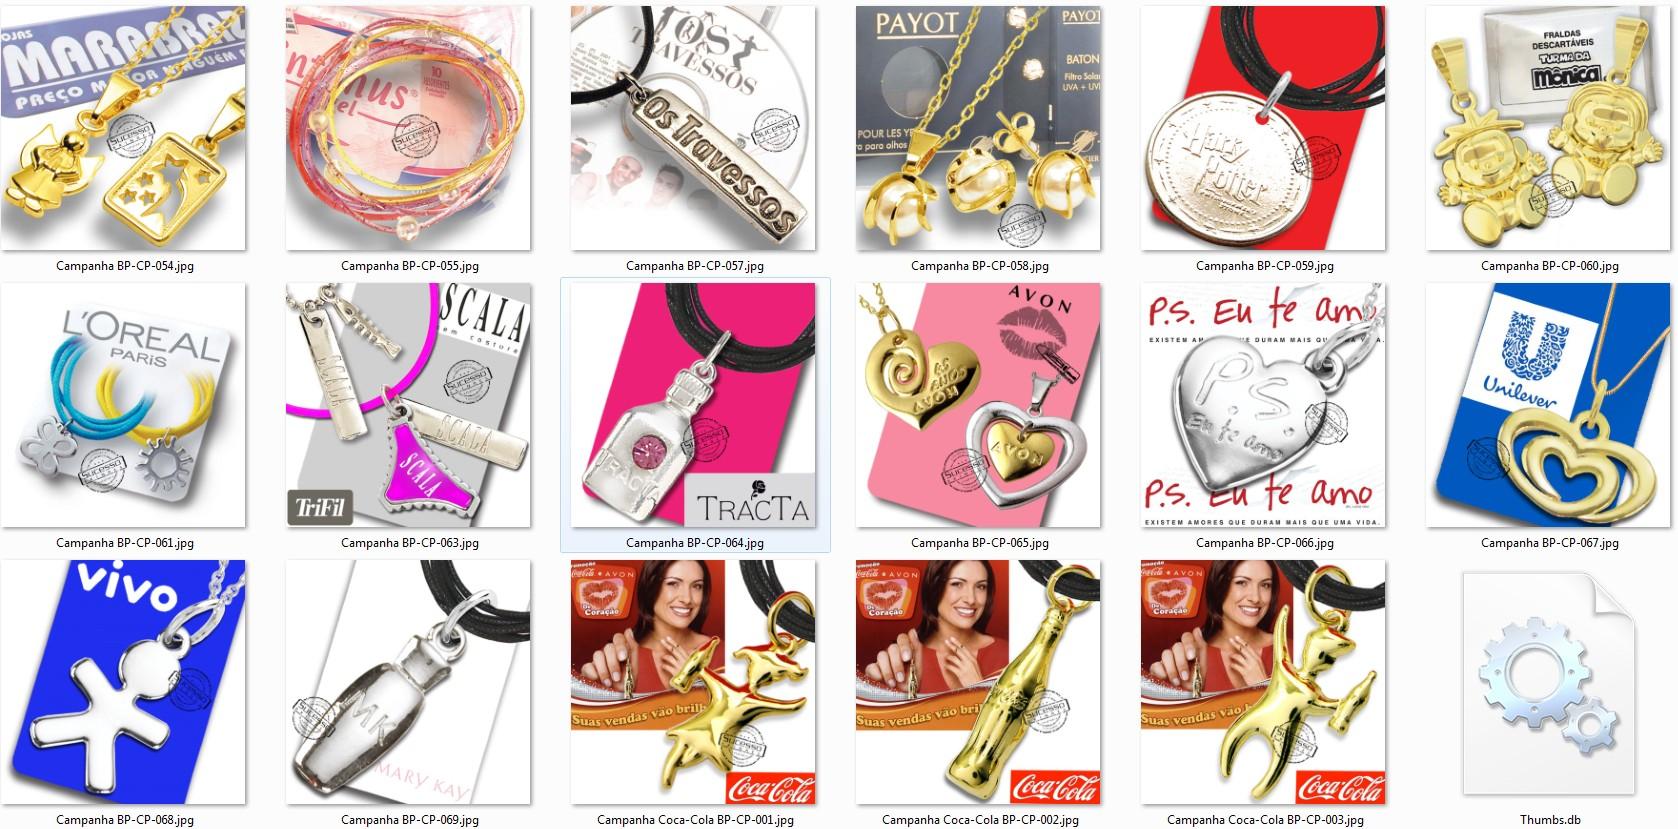 bijuteria promocional personalizada anel pulseira corrente pingente 2